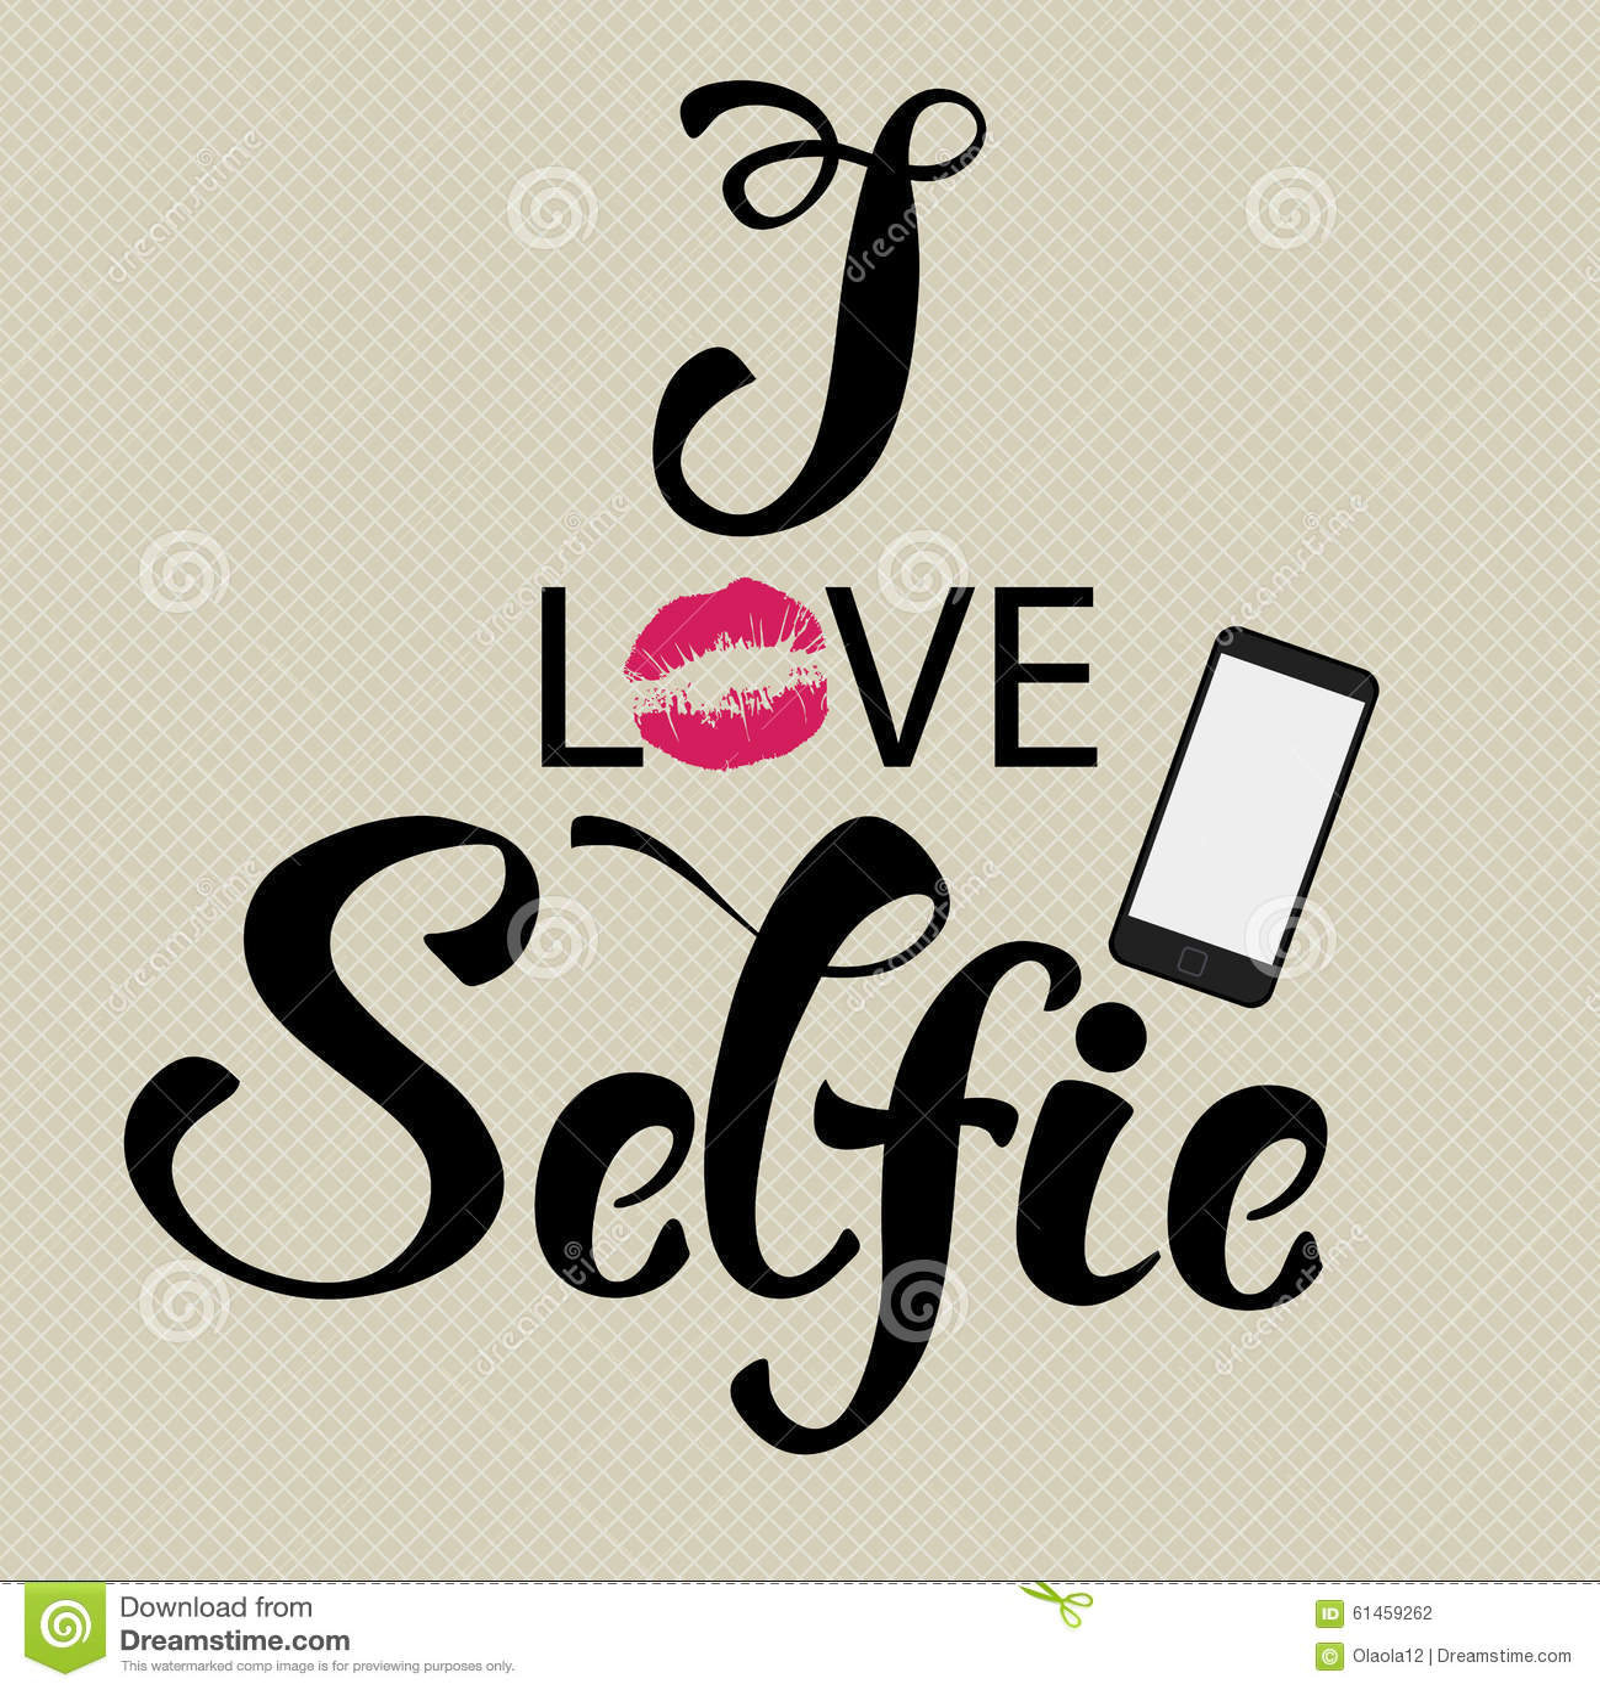 selfie decorative lettering